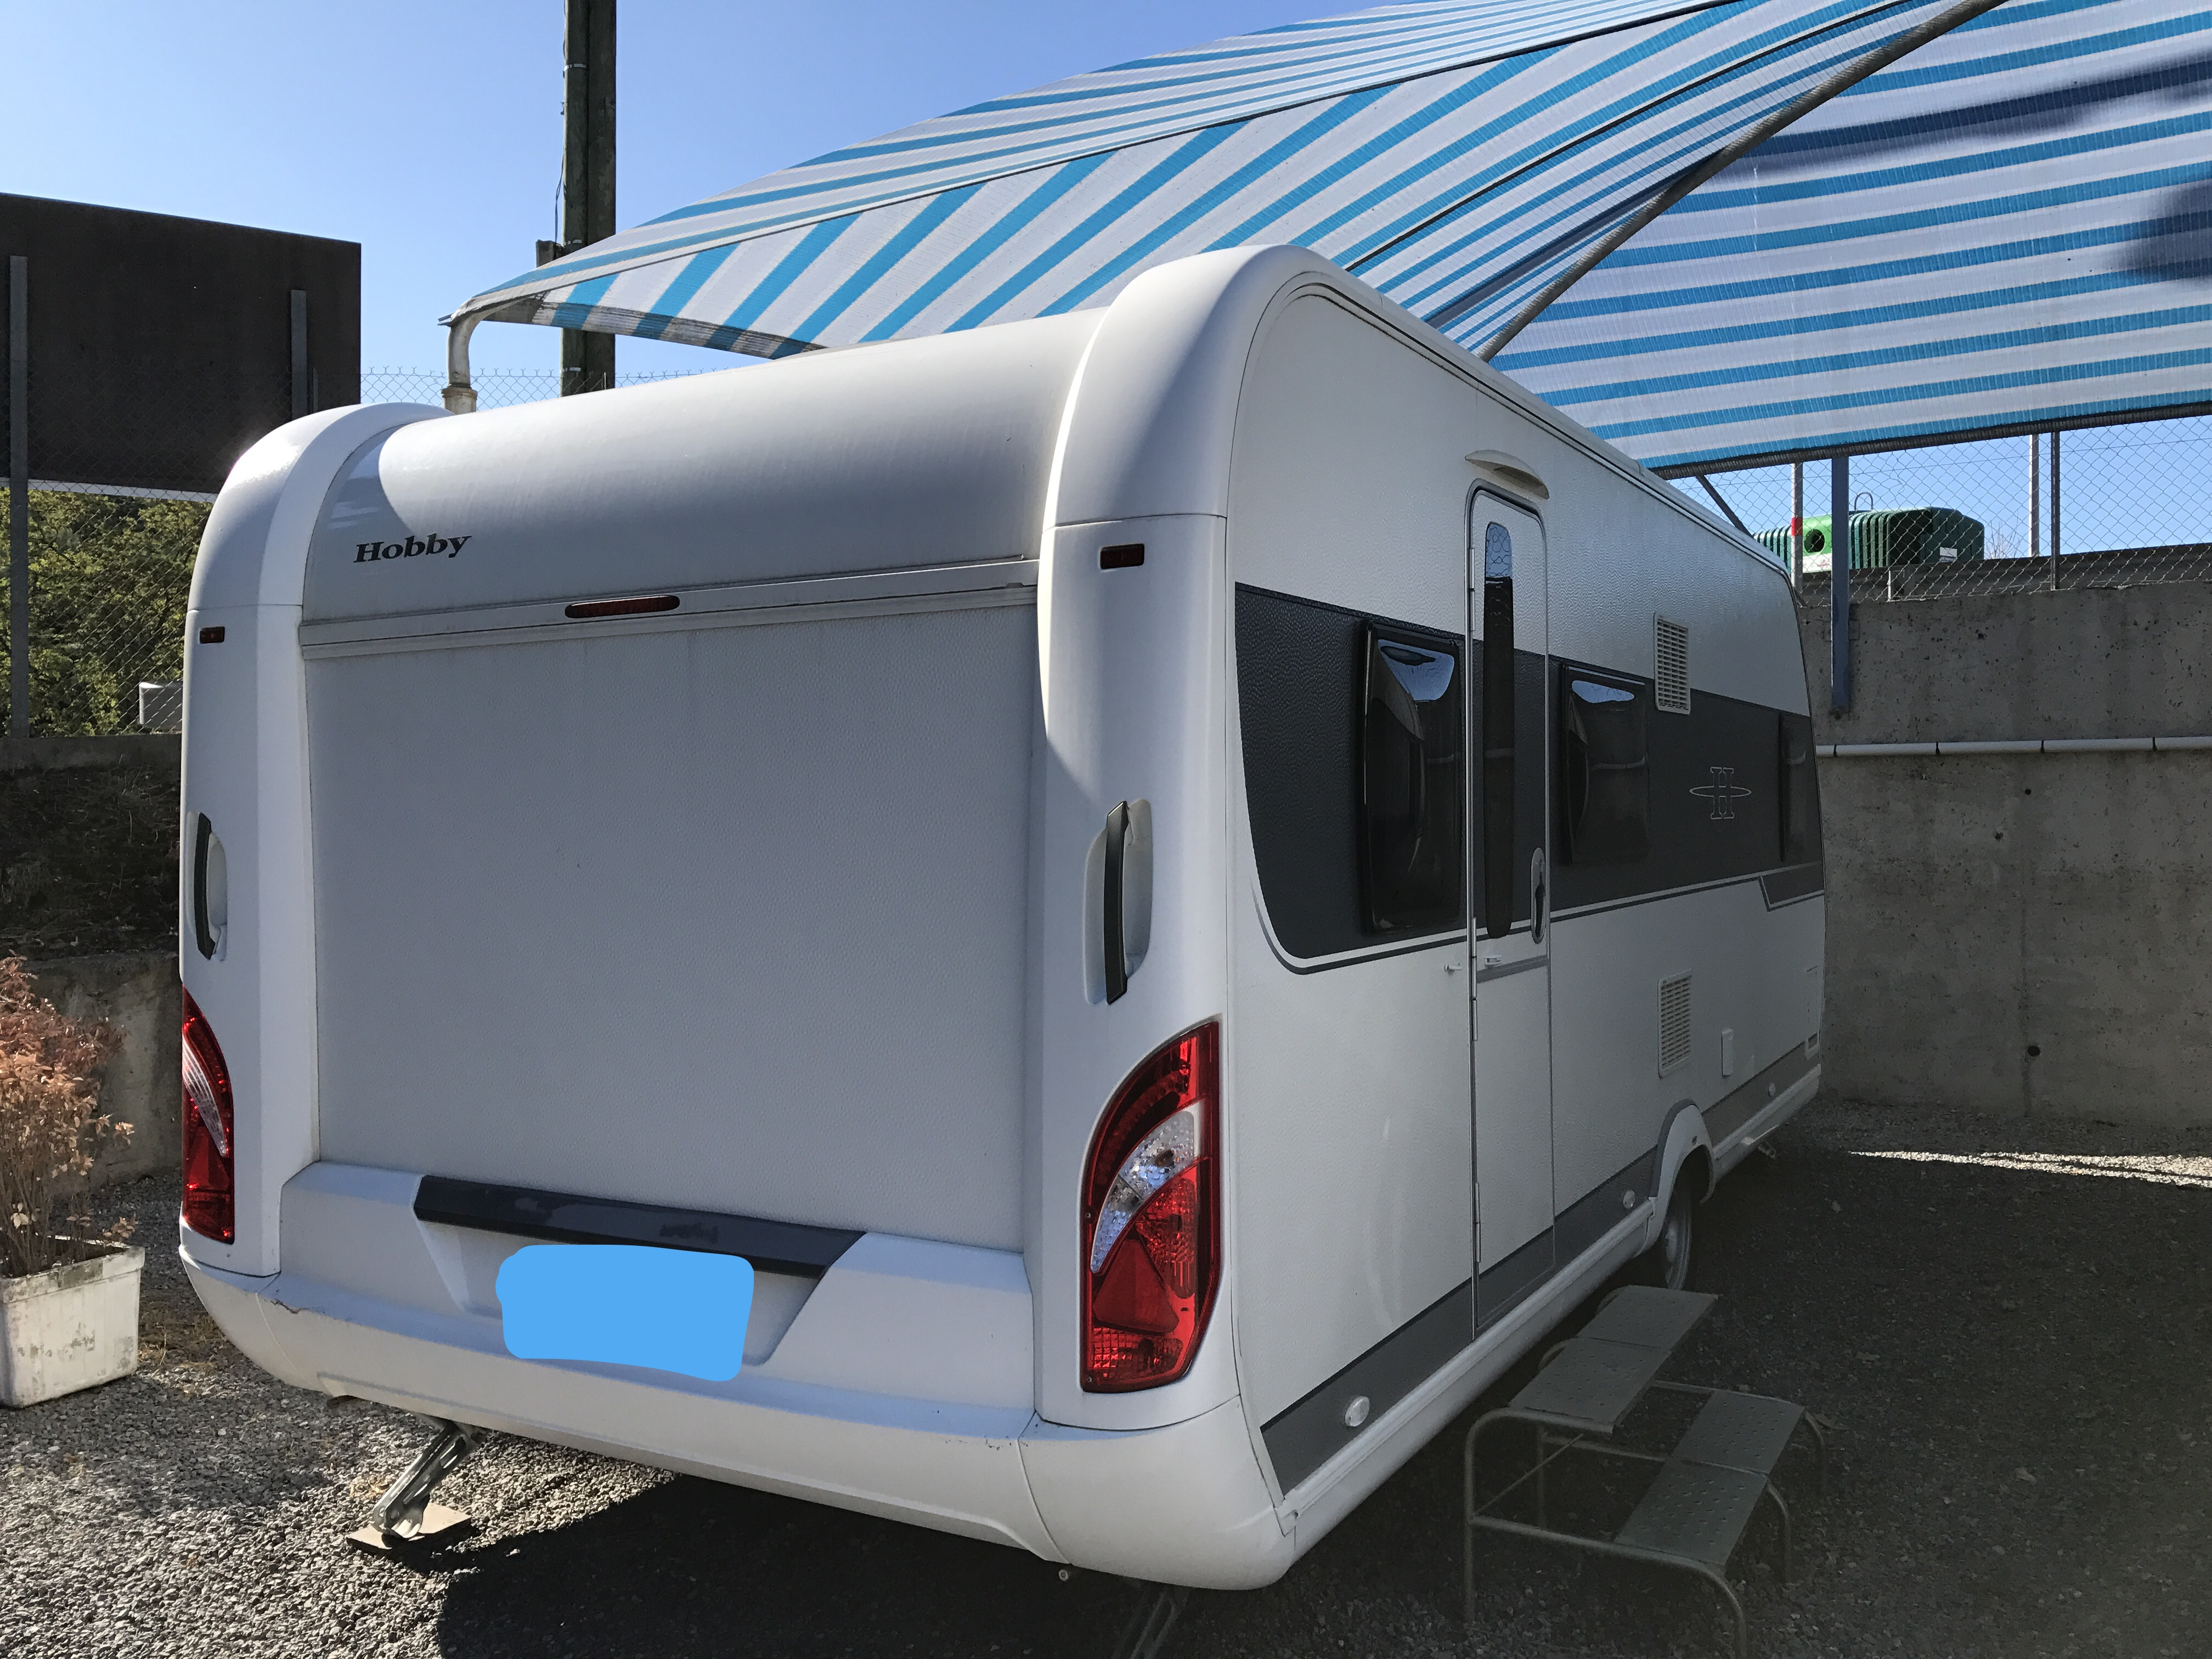 hobby 560 kmfe de luxe occasion caravane vendre en alpes maritimes 6 ref 12648. Black Bedroom Furniture Sets. Home Design Ideas